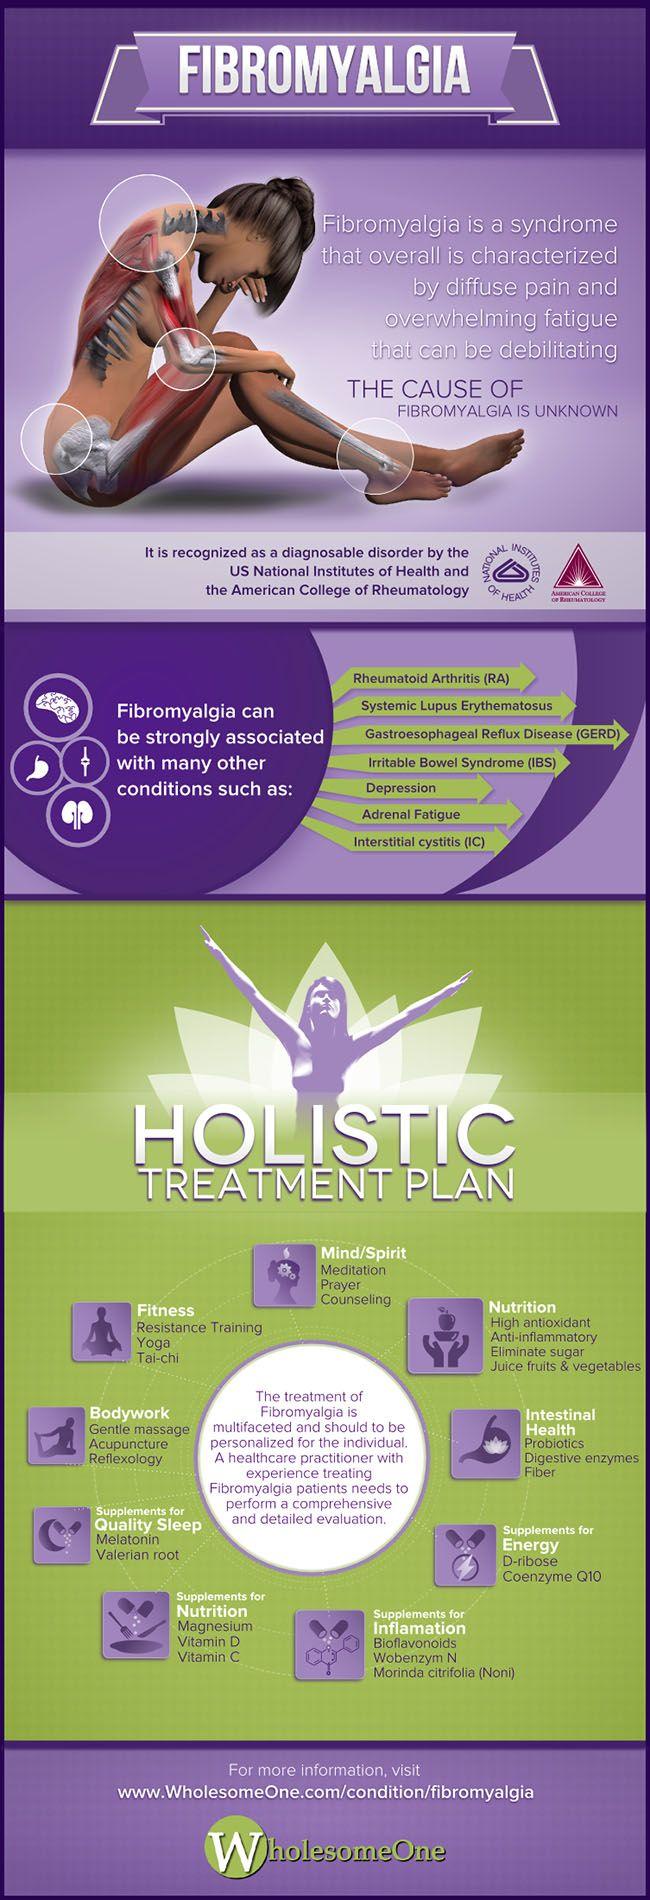 Fibromyalgia holistic and alternative ideas and strategies